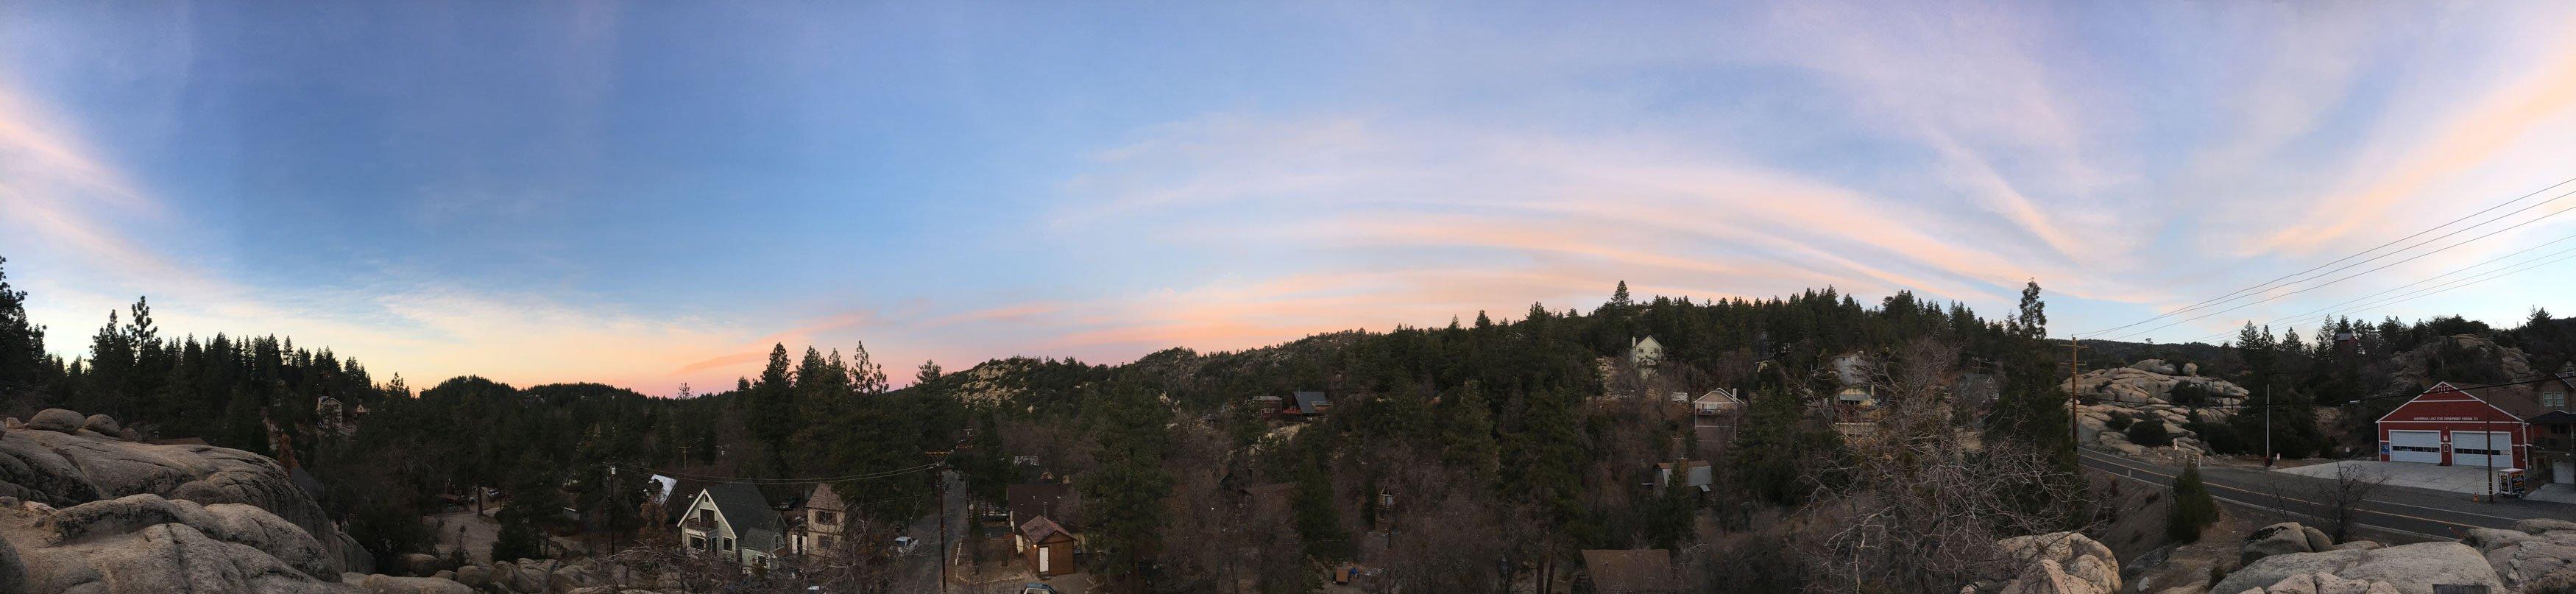 Panoramic view of Arrowbear Lake at sunset